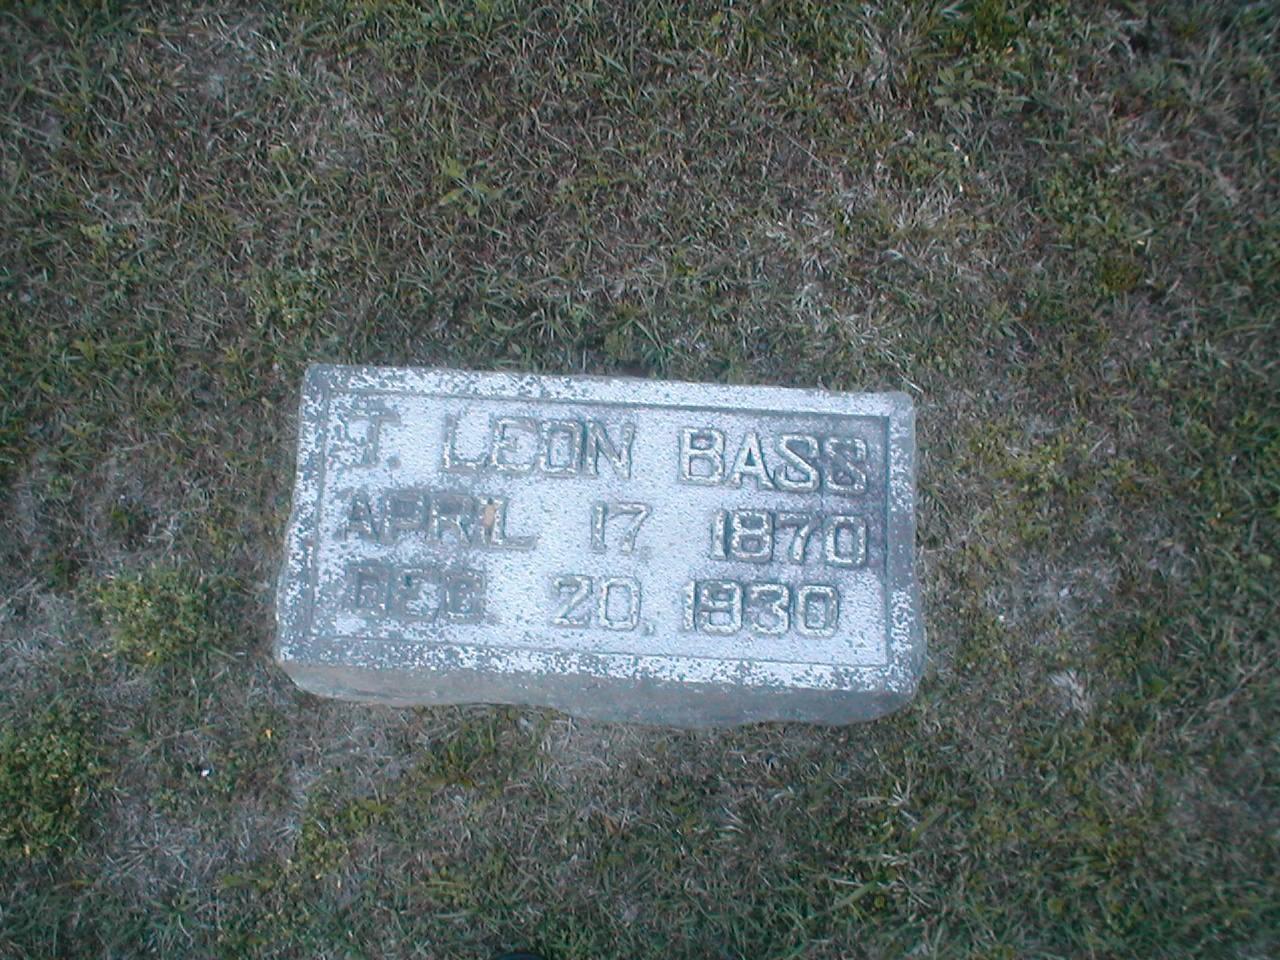 Leon Bass